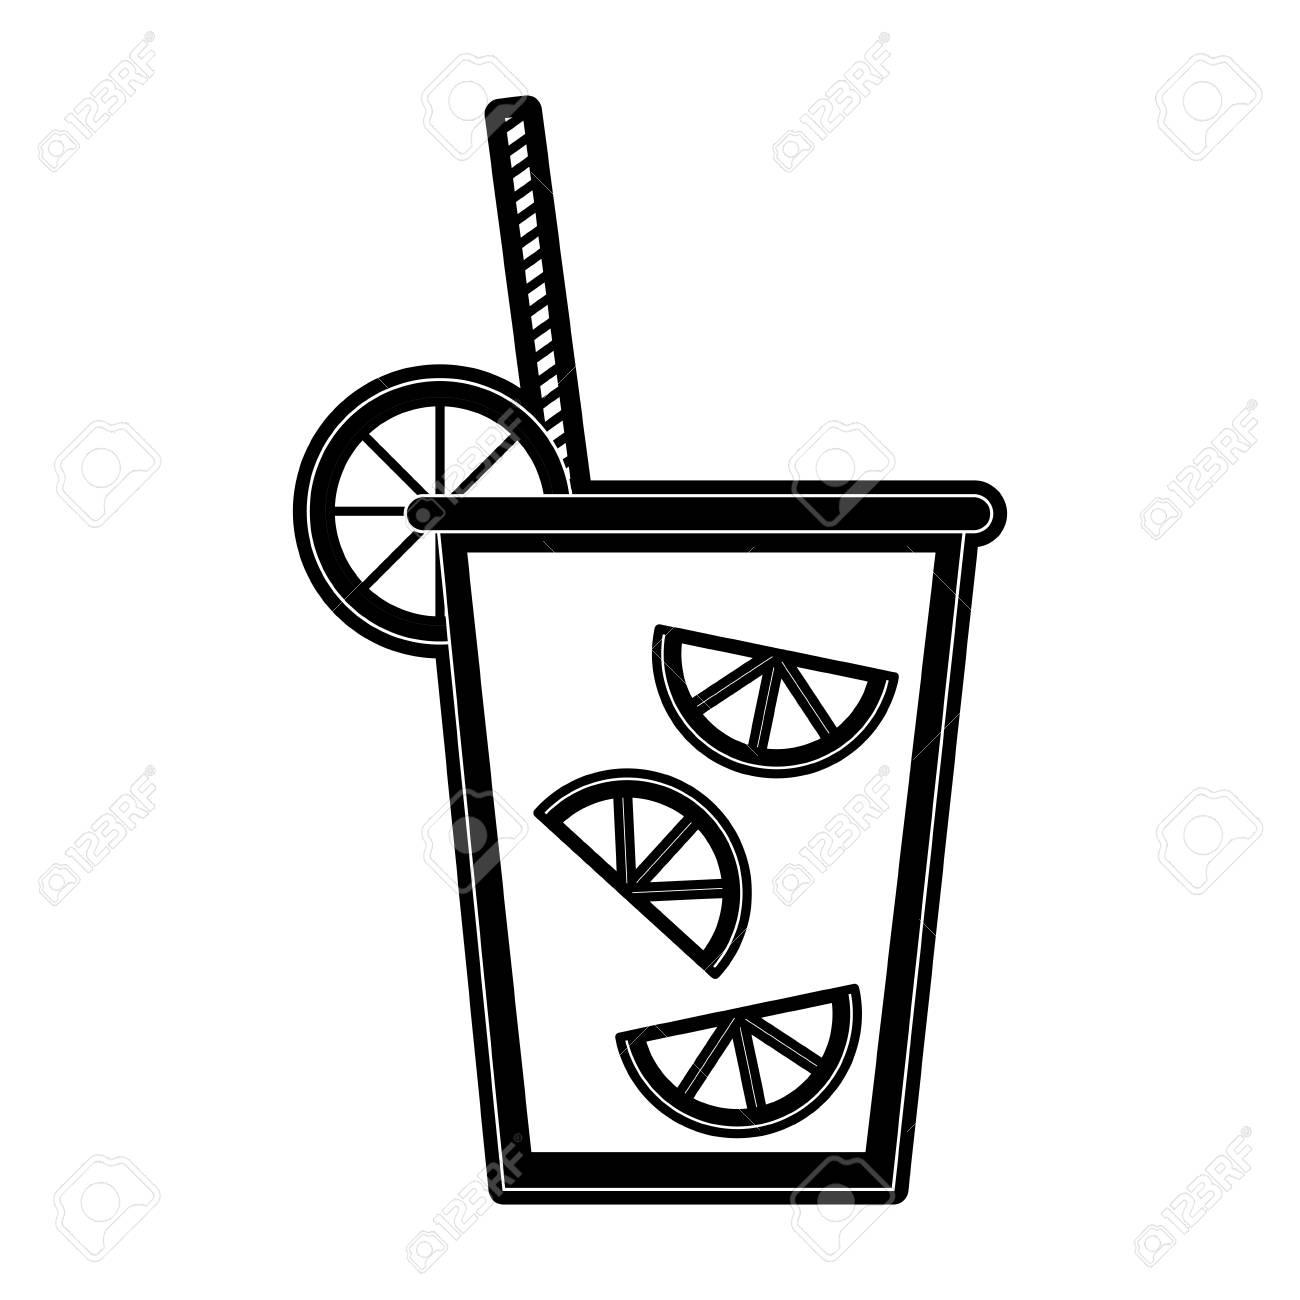 lemonade fruit juice icon image vector illustration design black royalty free cliparts vectors and stock illustration image 87669697 lemonade fruit juice icon image vector illustration design black